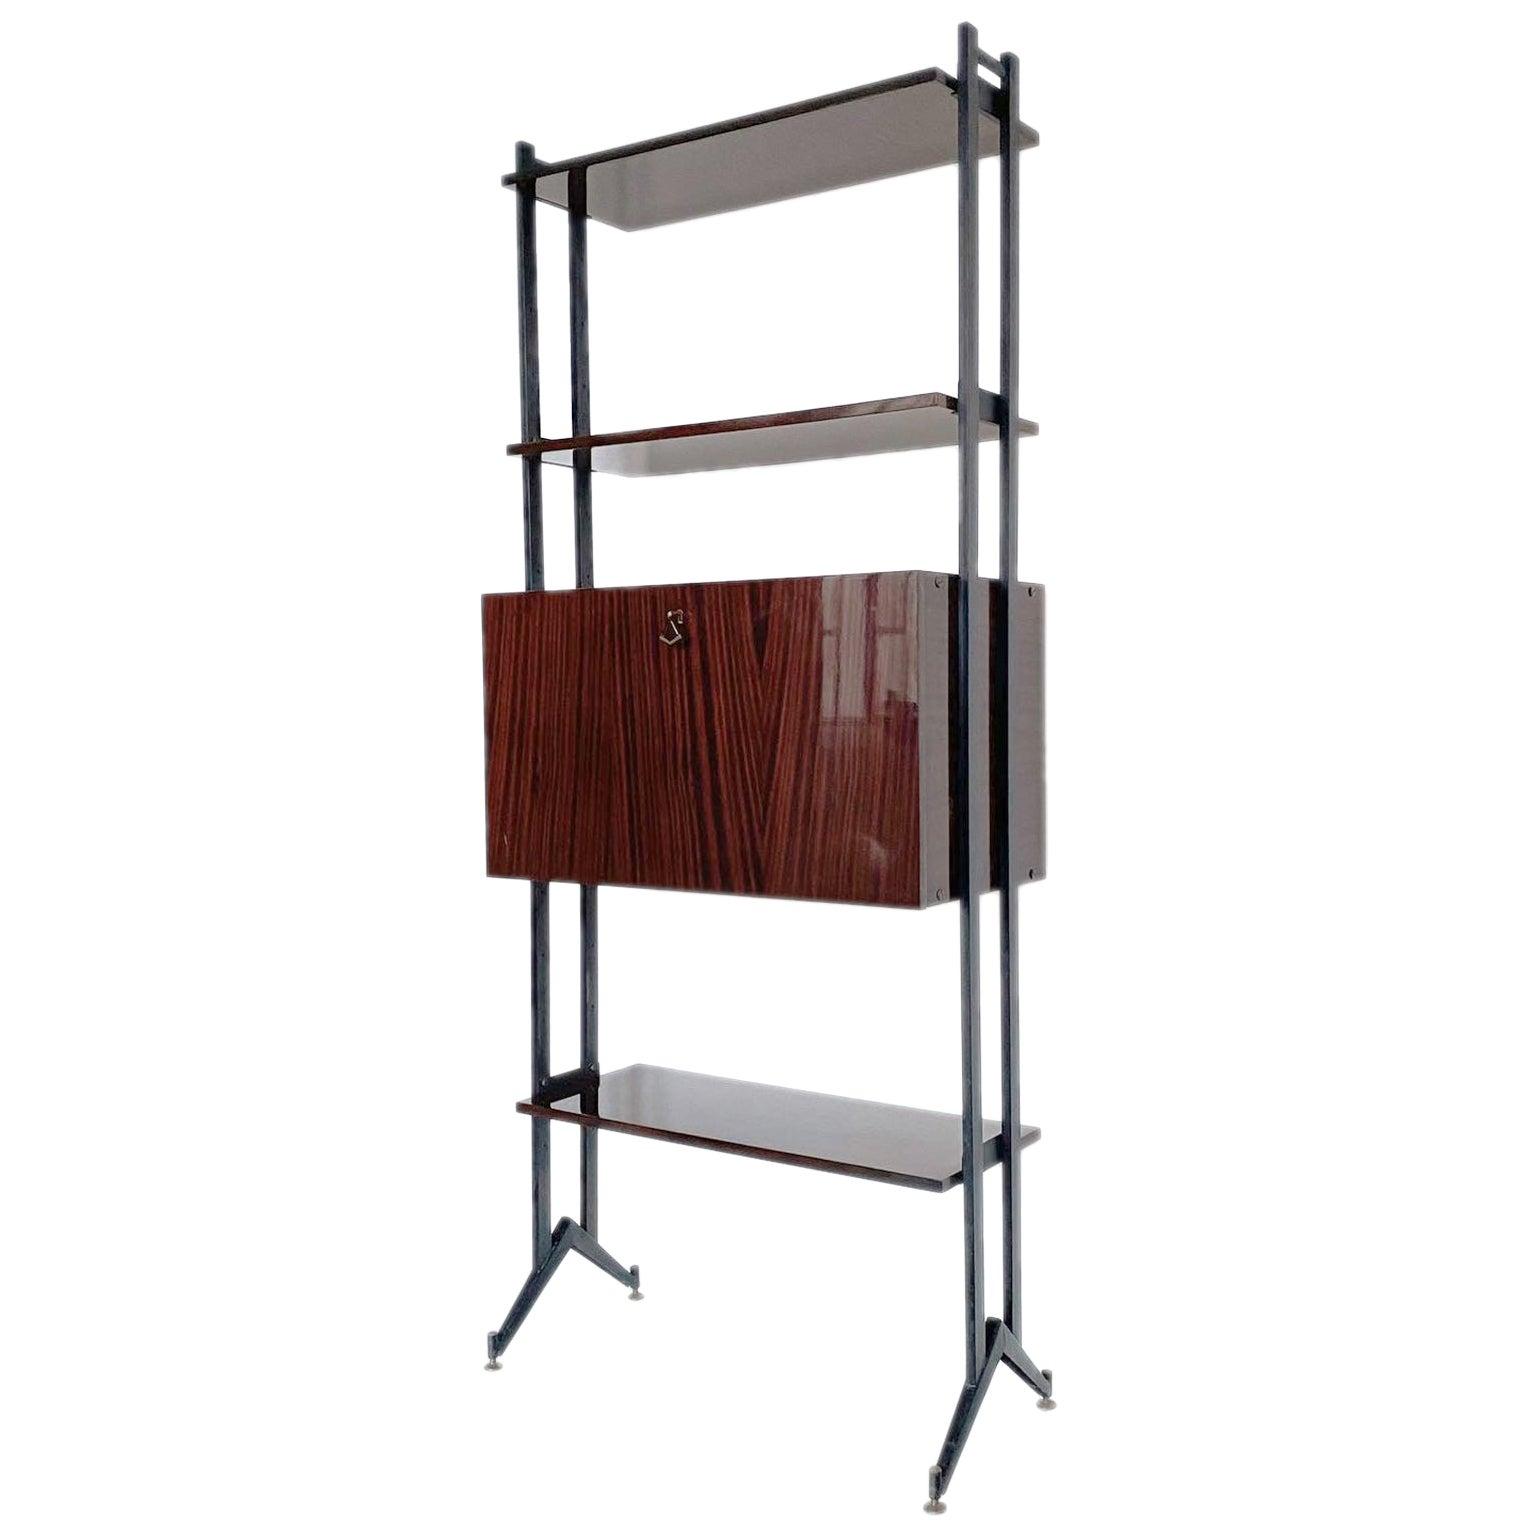 Modular Bookshelf in Mahogany Veneer